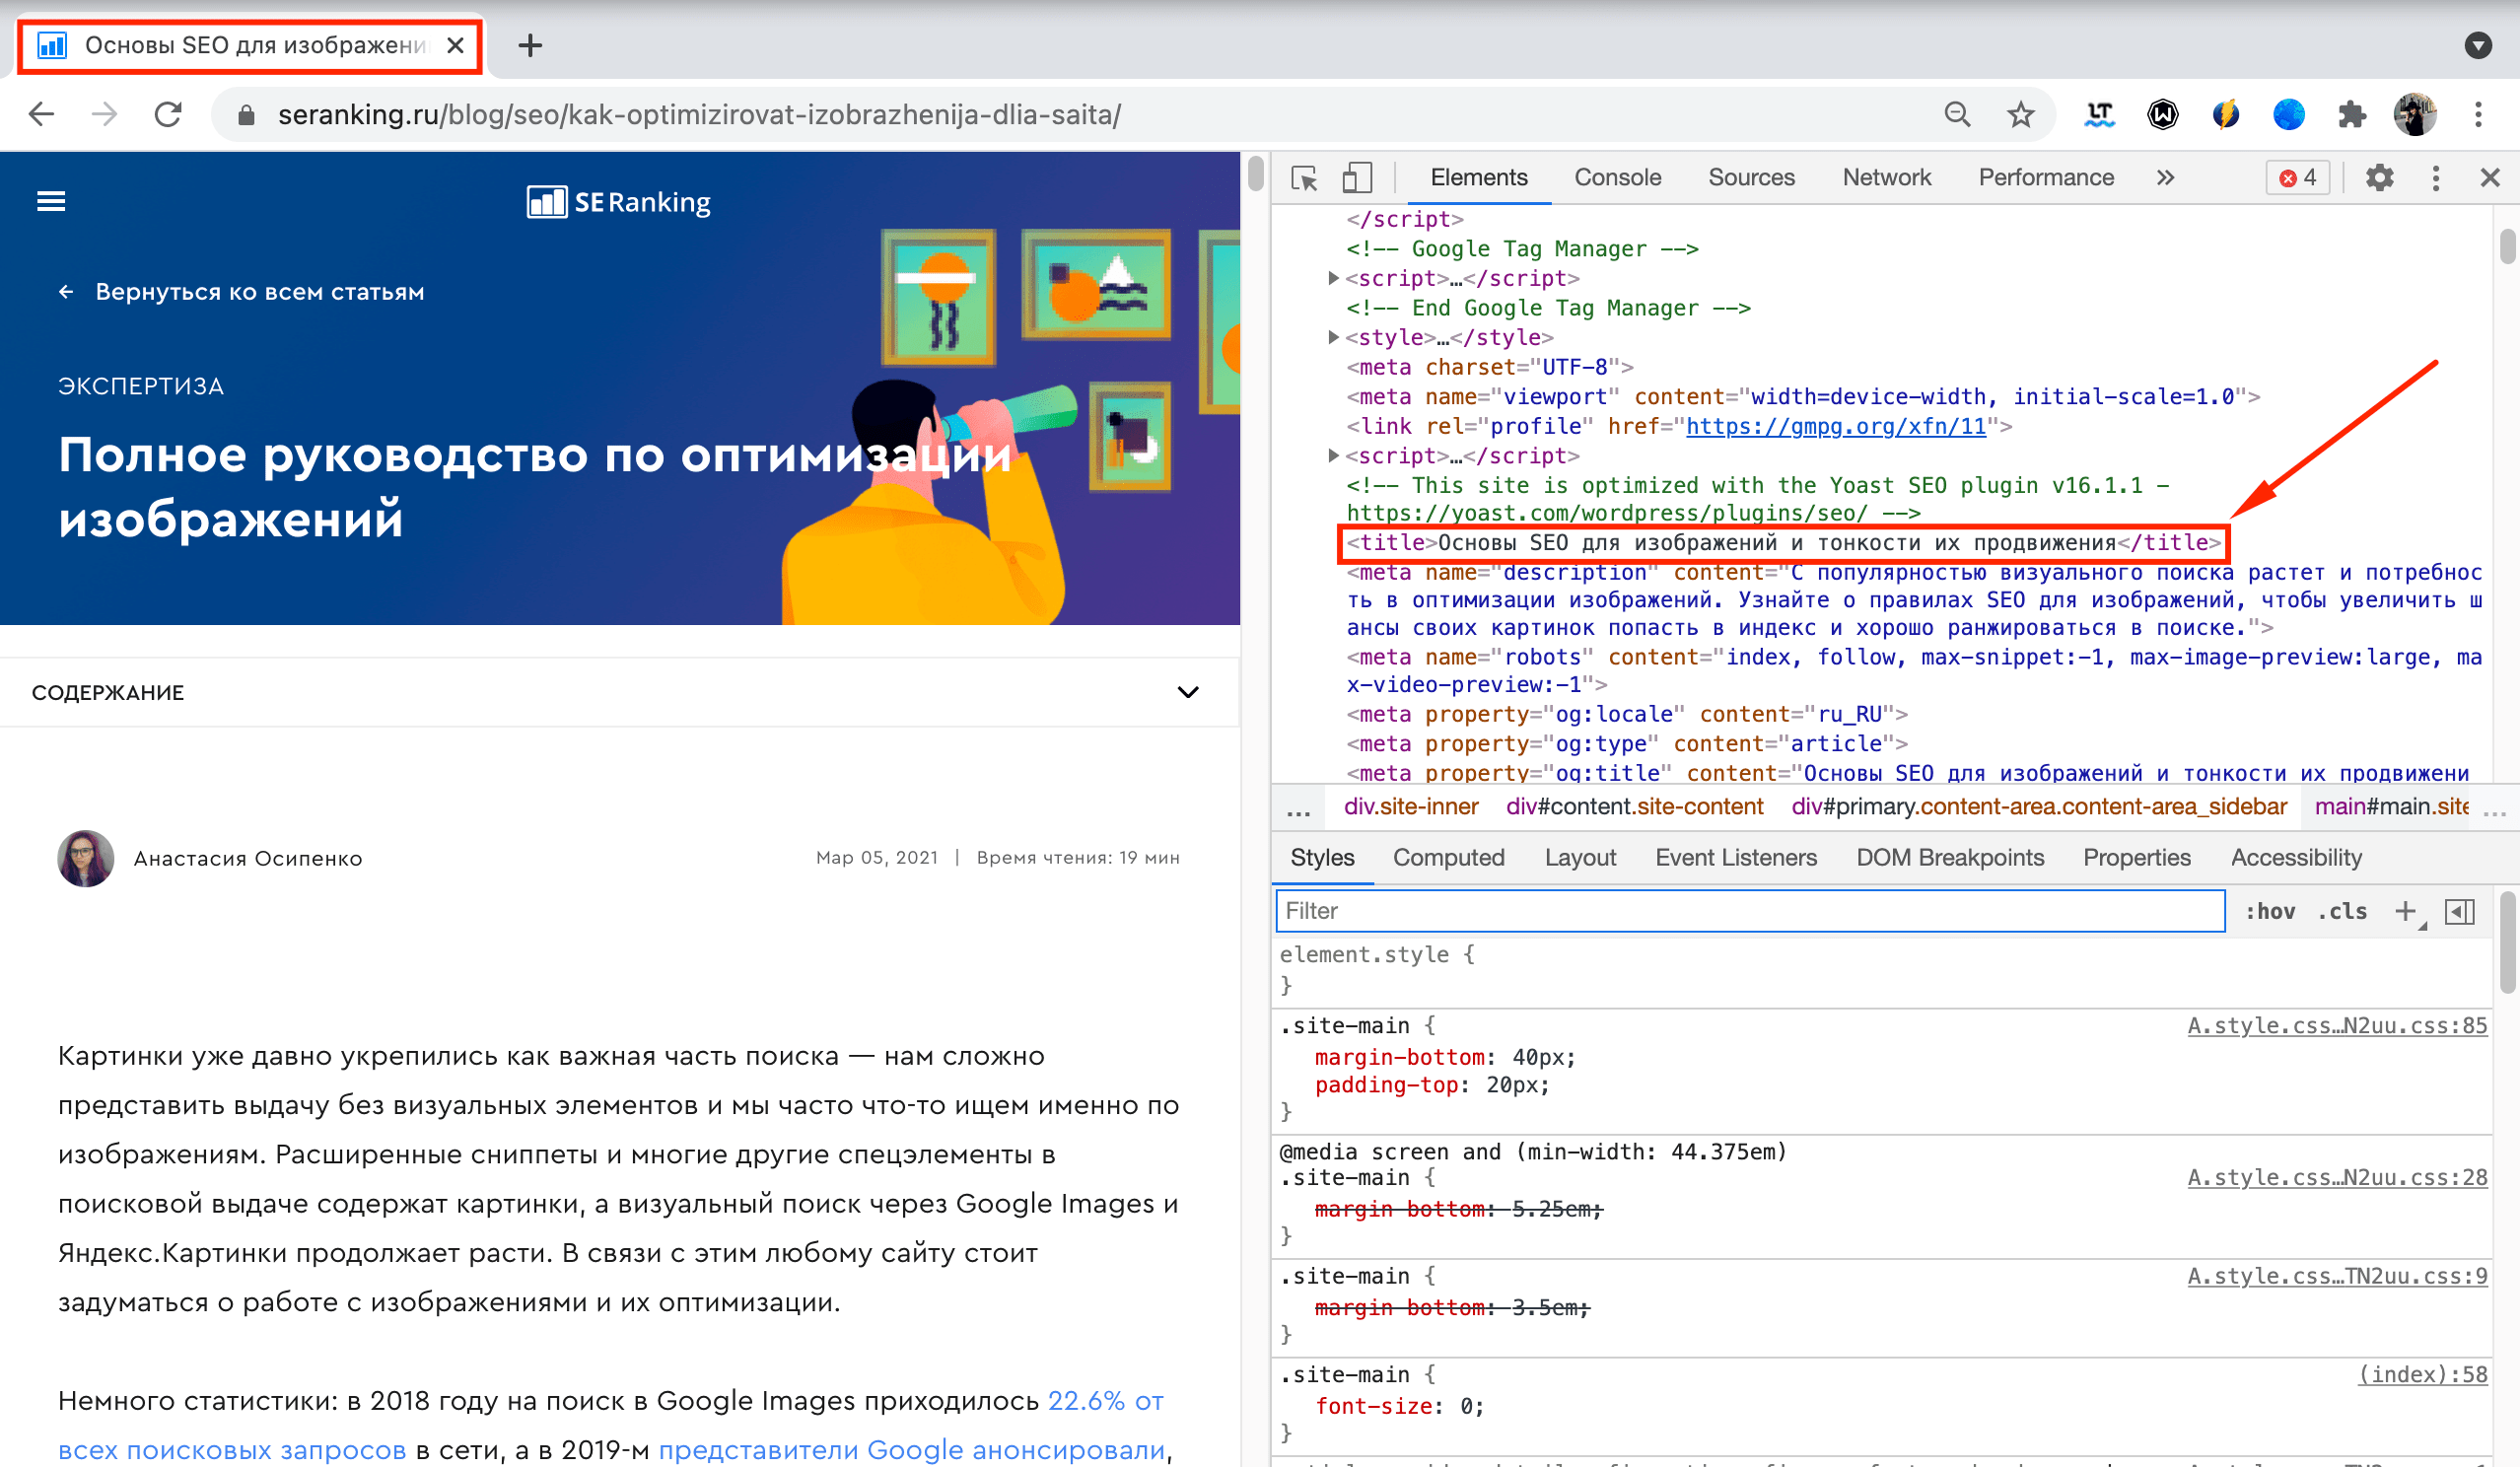 Код тайтла на странице